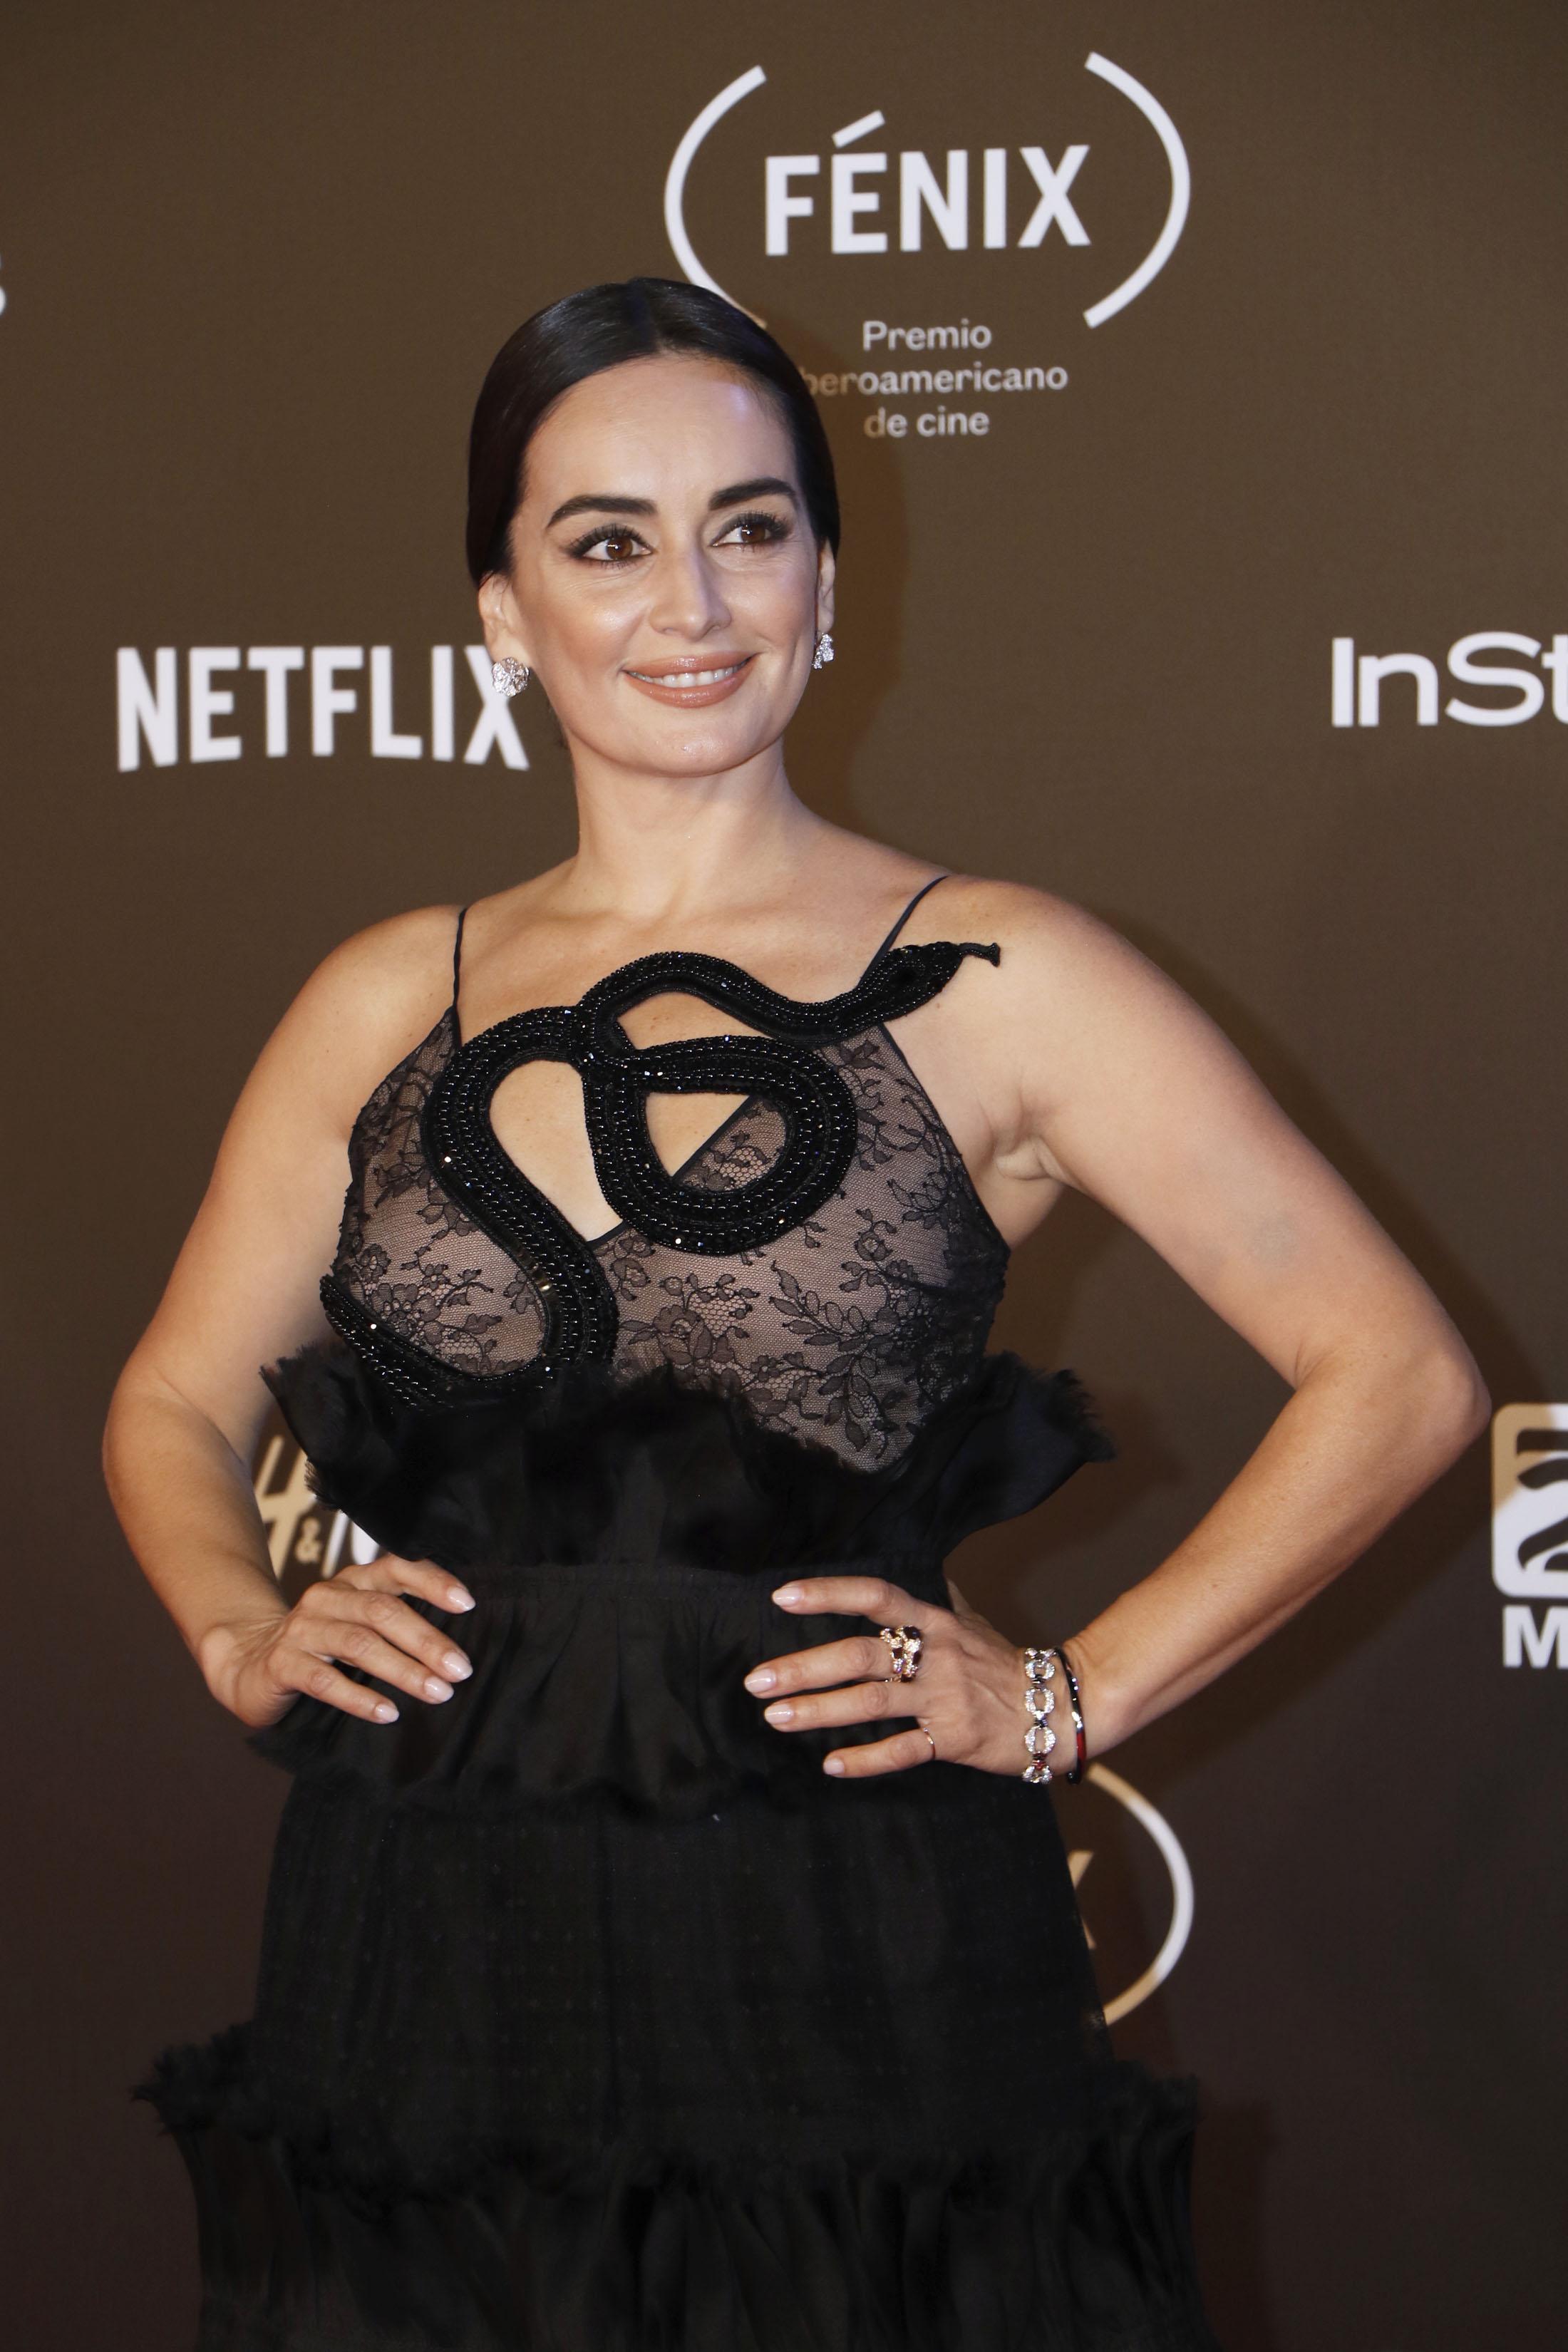 Amor A La Mexicana Movie ana de la reguera - wikipedia